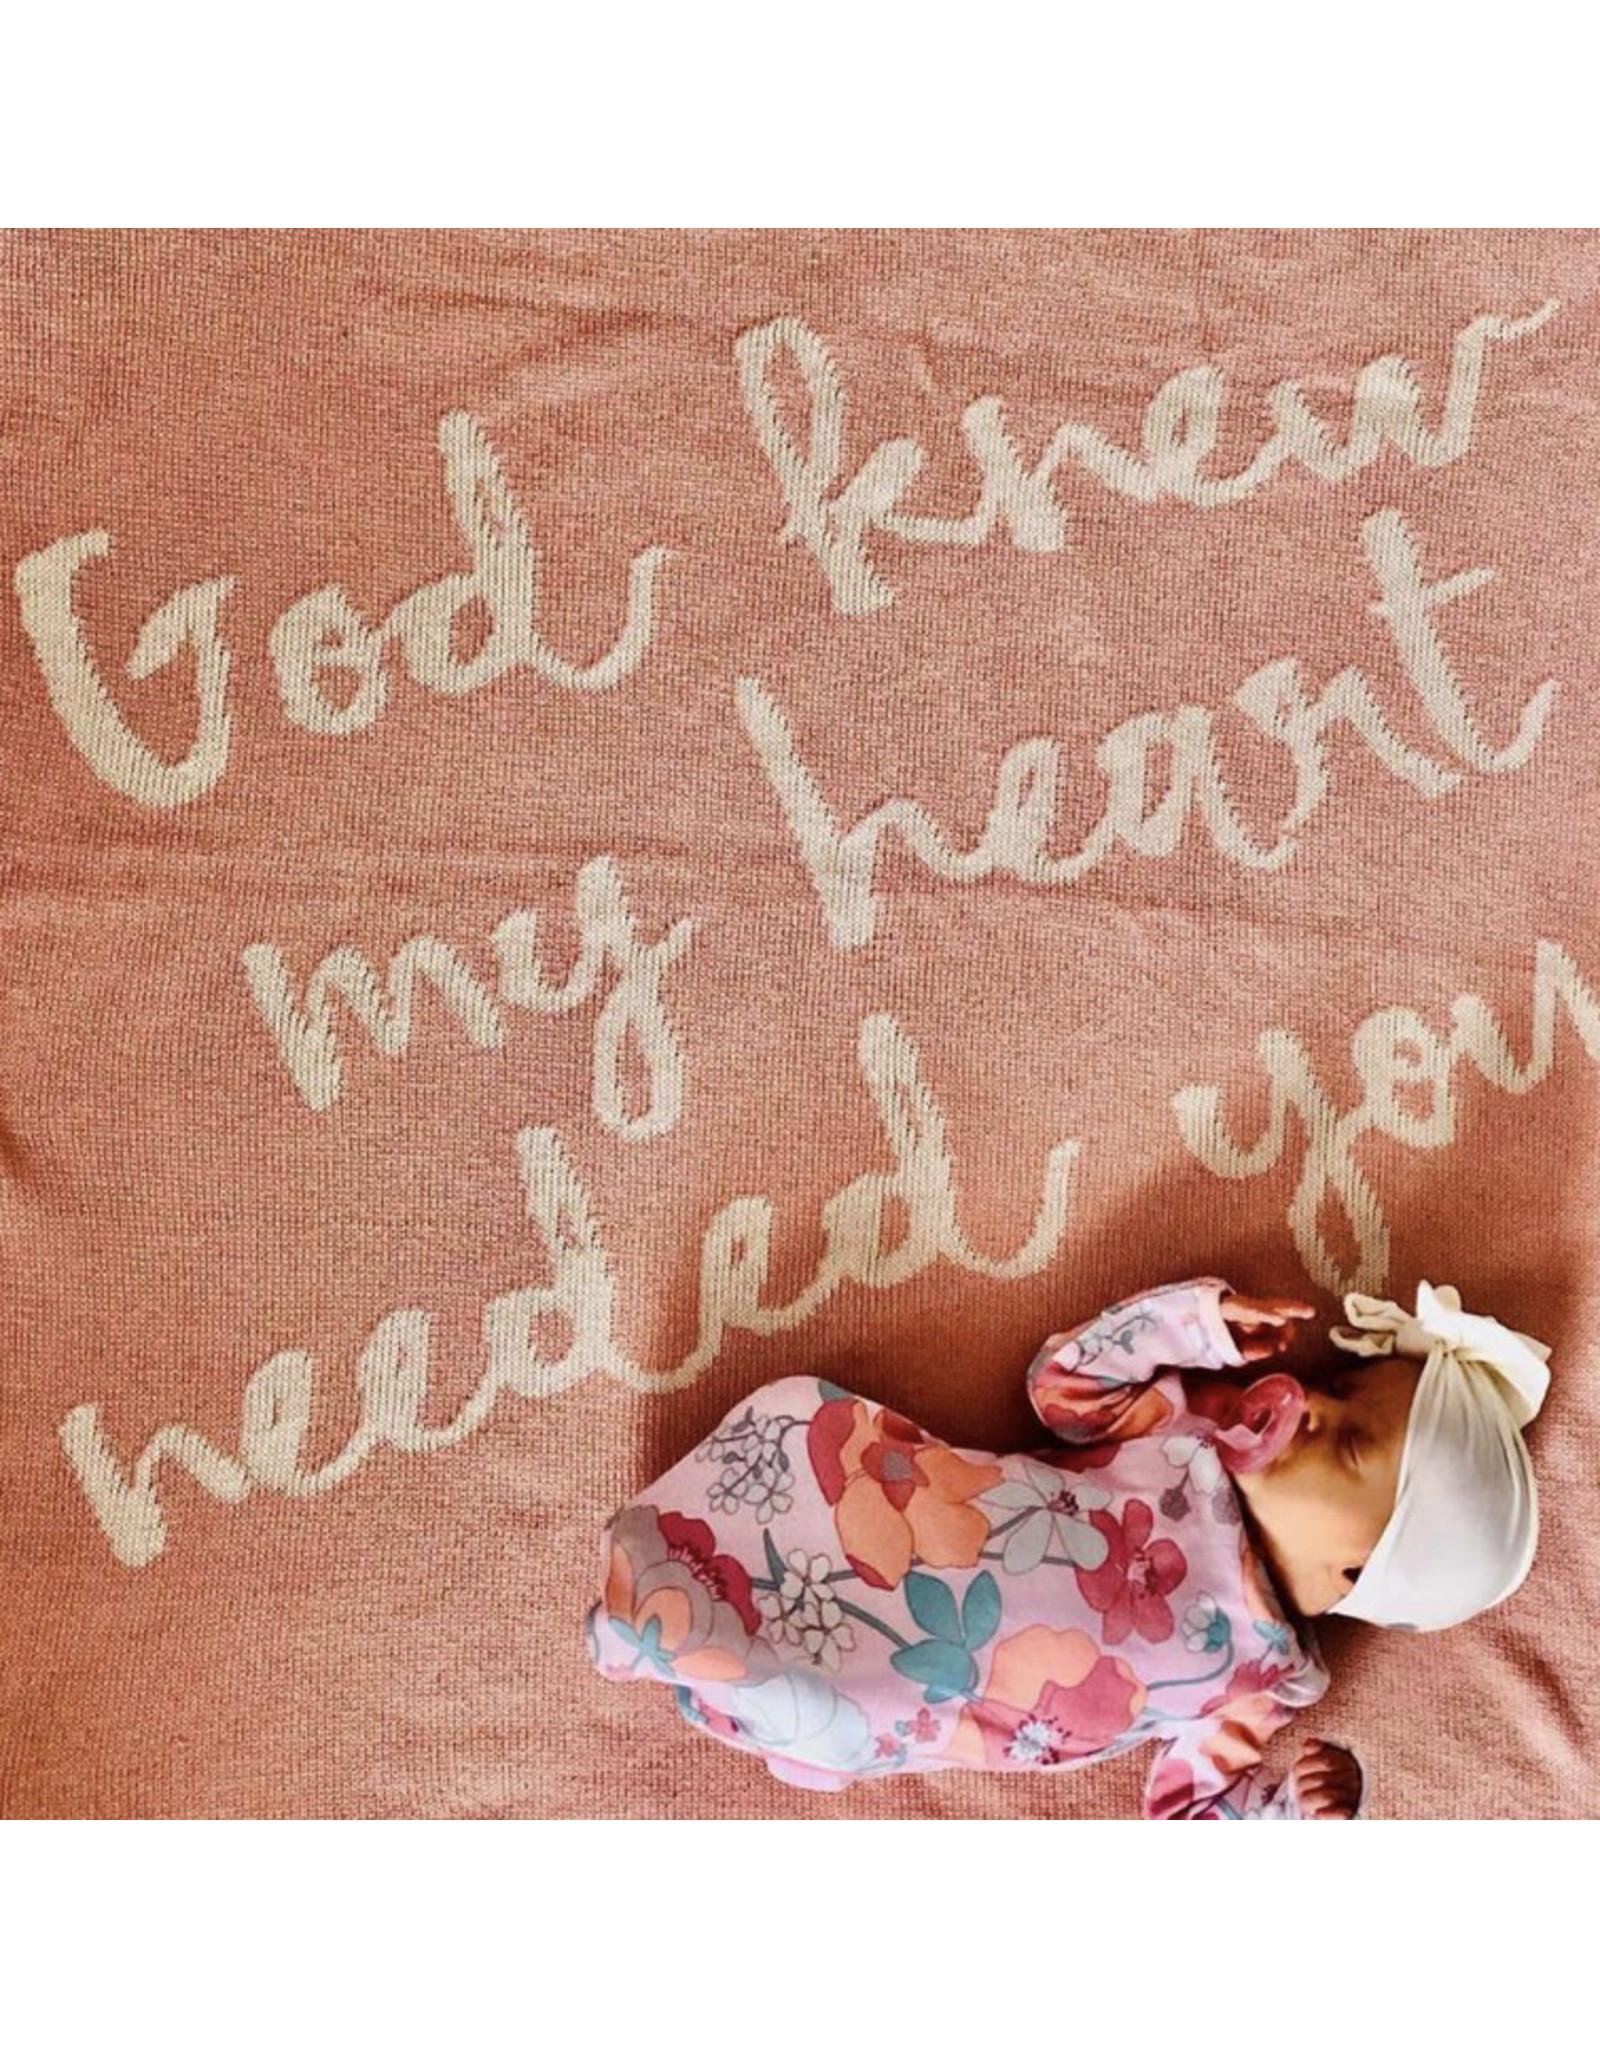 "Modern Burlap Modern Burlap- God Knew My Heart... 30"" x 40"" Throw Blanket: Cameo"